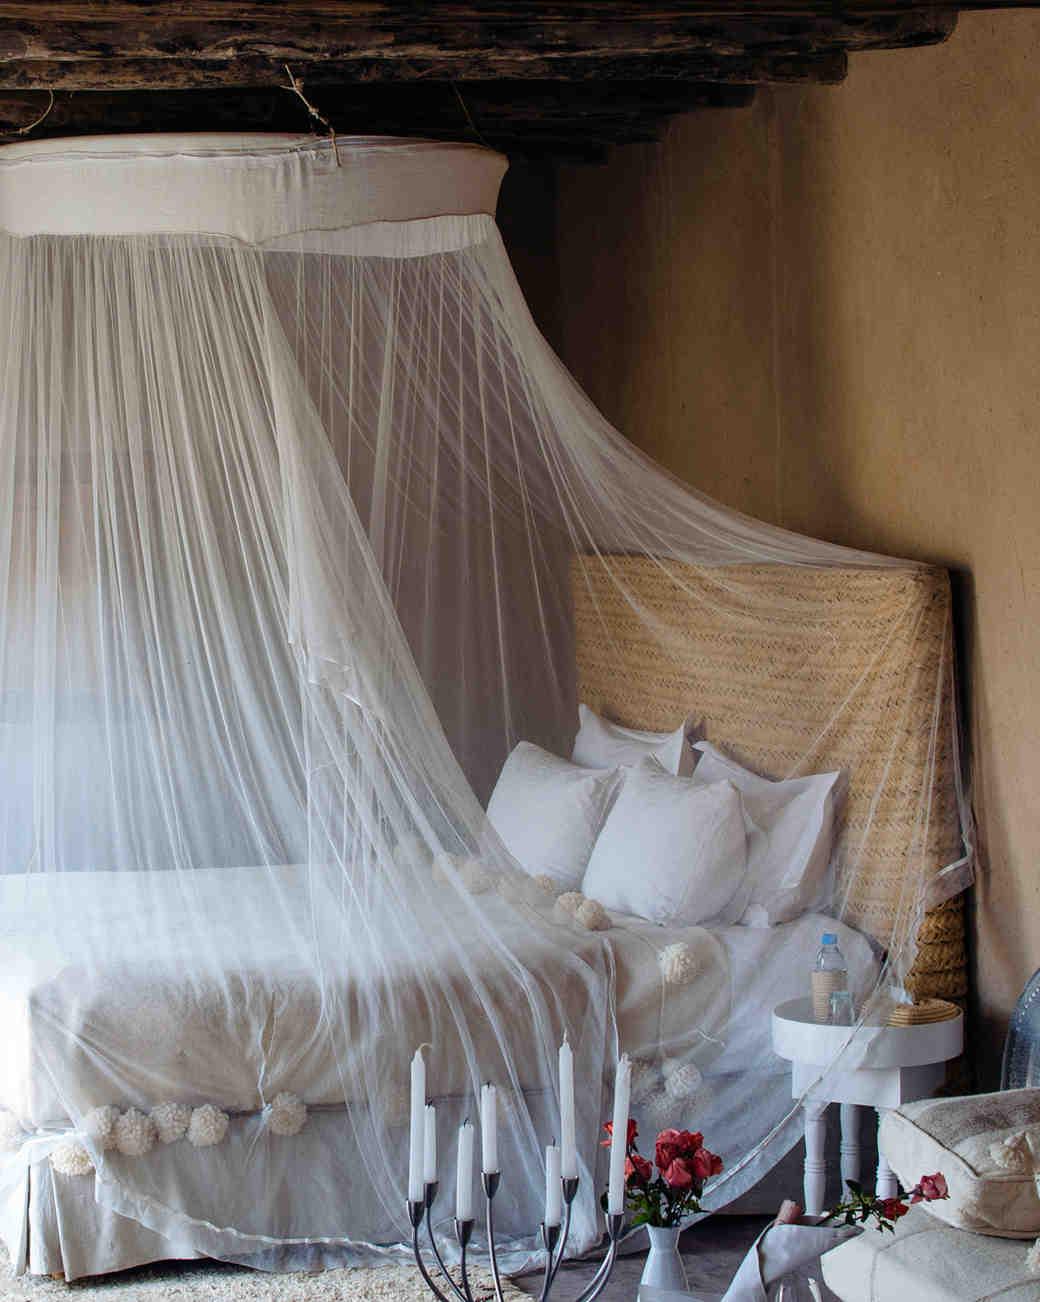 morocco-honeymoon-lapause-hotel-dsc0106-0914.jpg